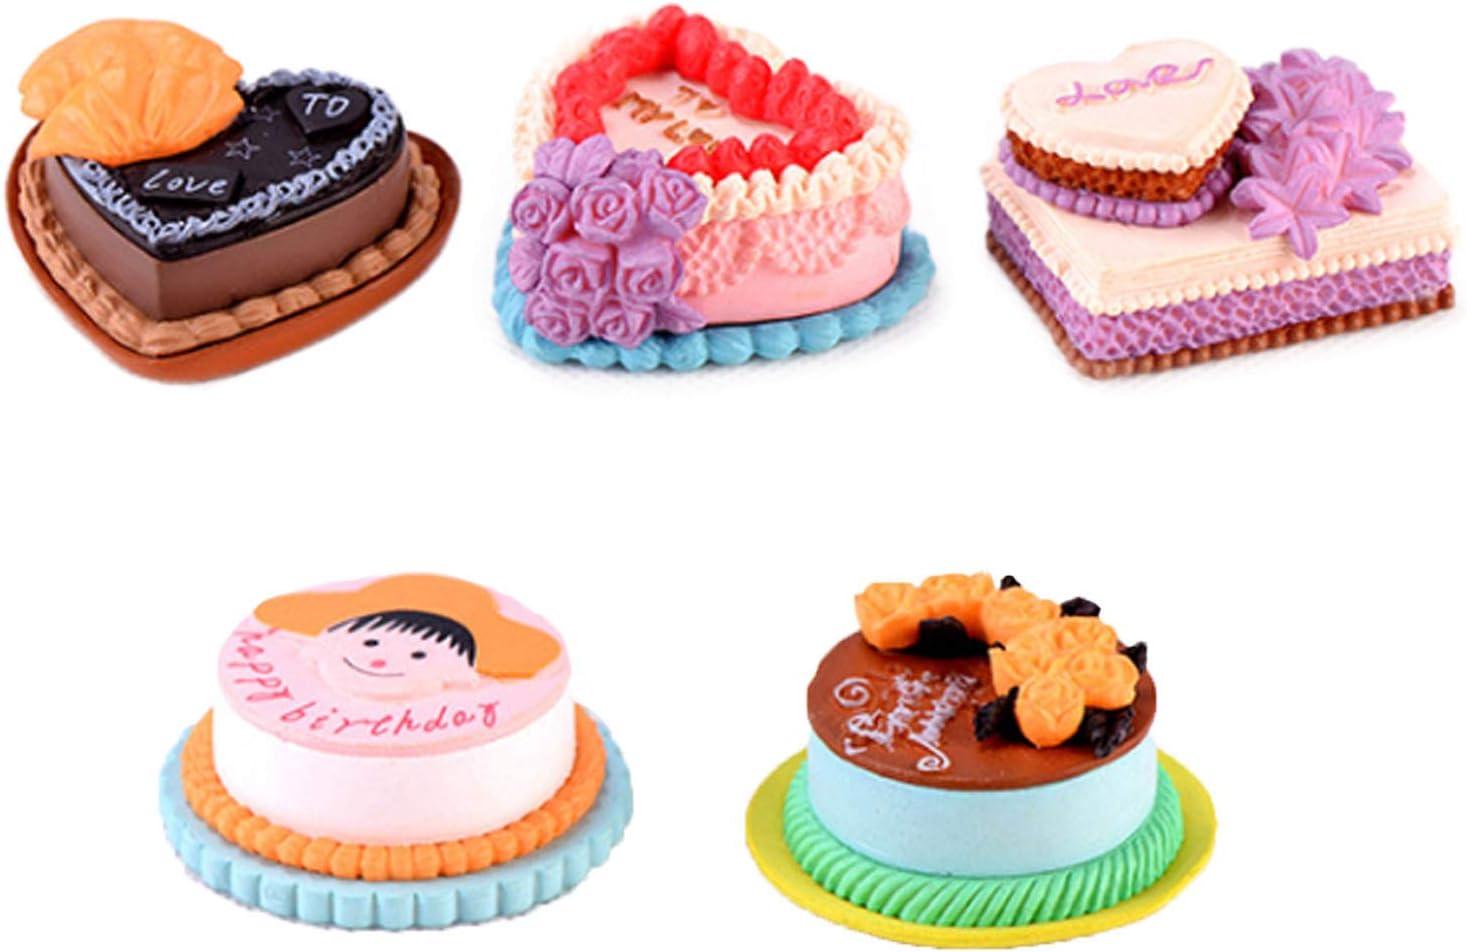 ERANCE 5 Pcs Cake Dollhouse Miniature Food, Miniature Cake Food Dessert Models Dollhouse Decor, Miniature Pretend Play Mini Kitchen Food Cake Toppers